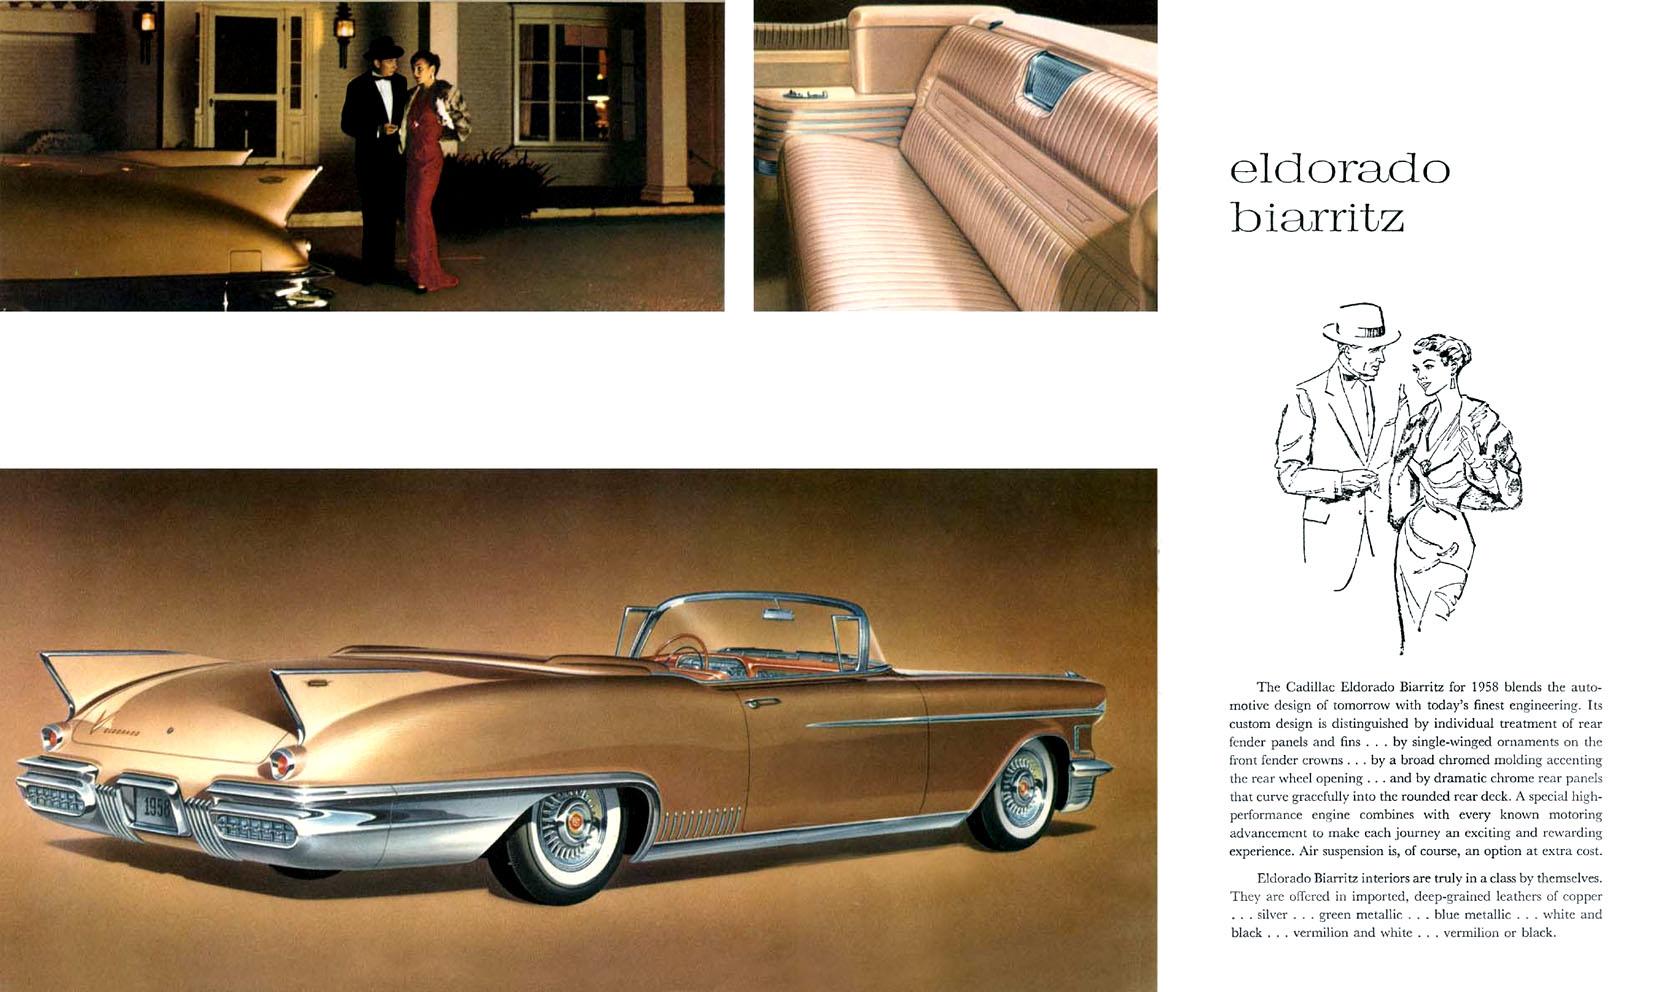 TunnelRam_Cadillac (61).jpg